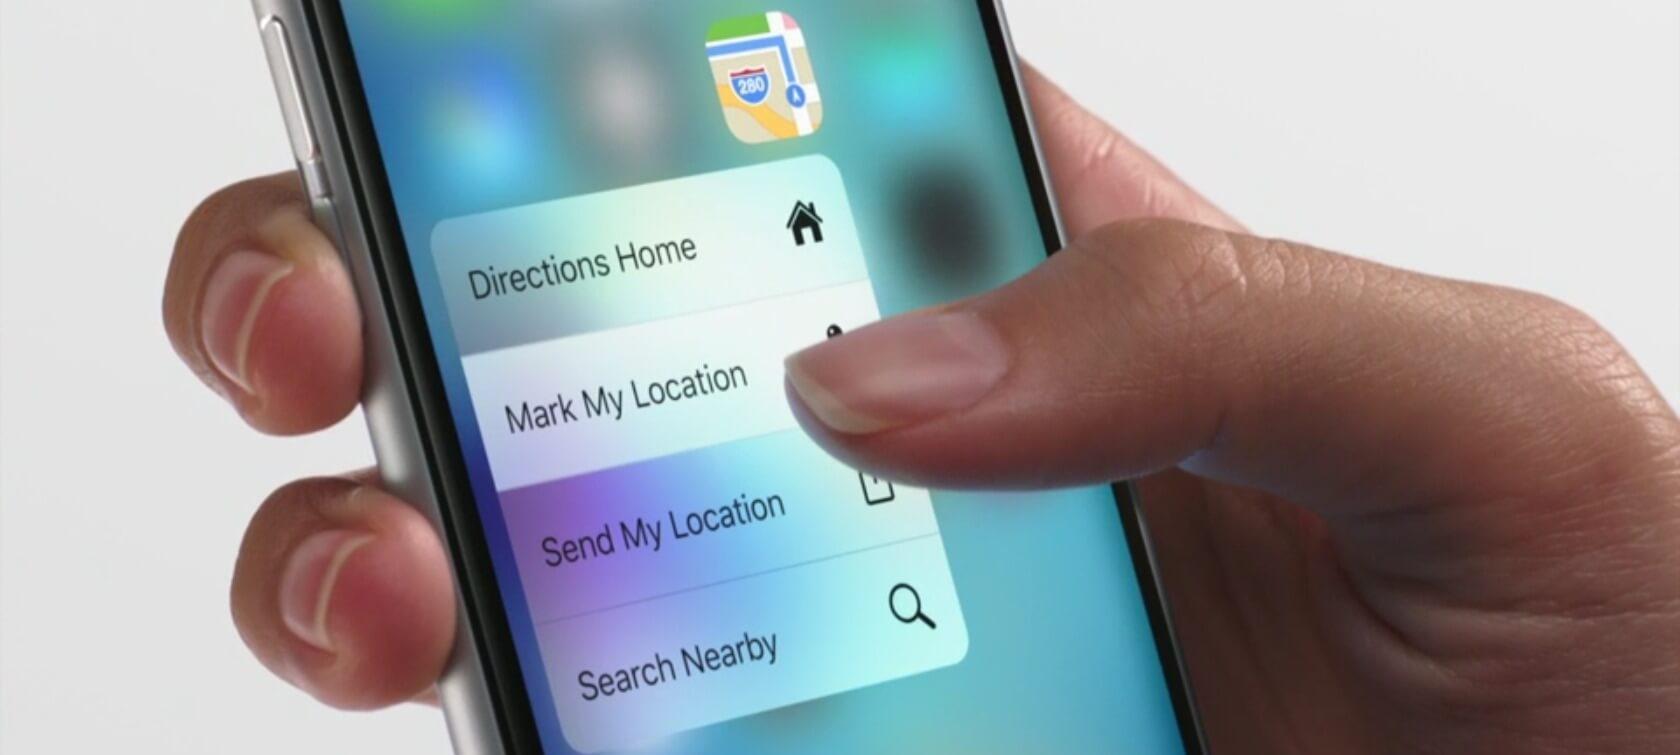 geklautes iphone 6 Plus hacken